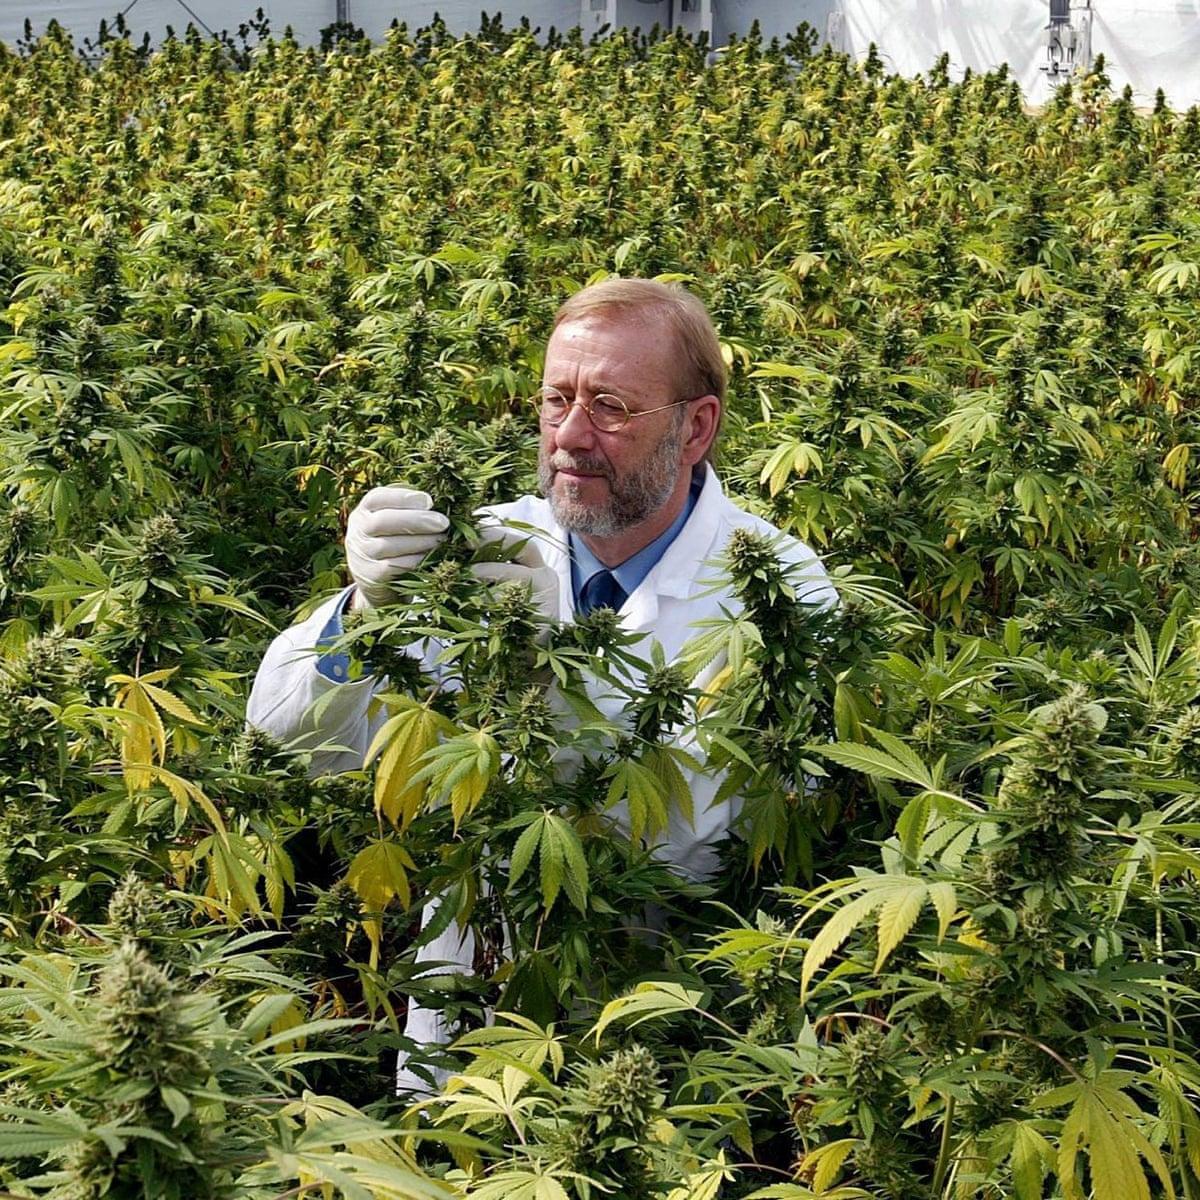 Inside Big Pharma S Fight To Block Recreational Marijuana Guardian Sustainable Business The Guardian